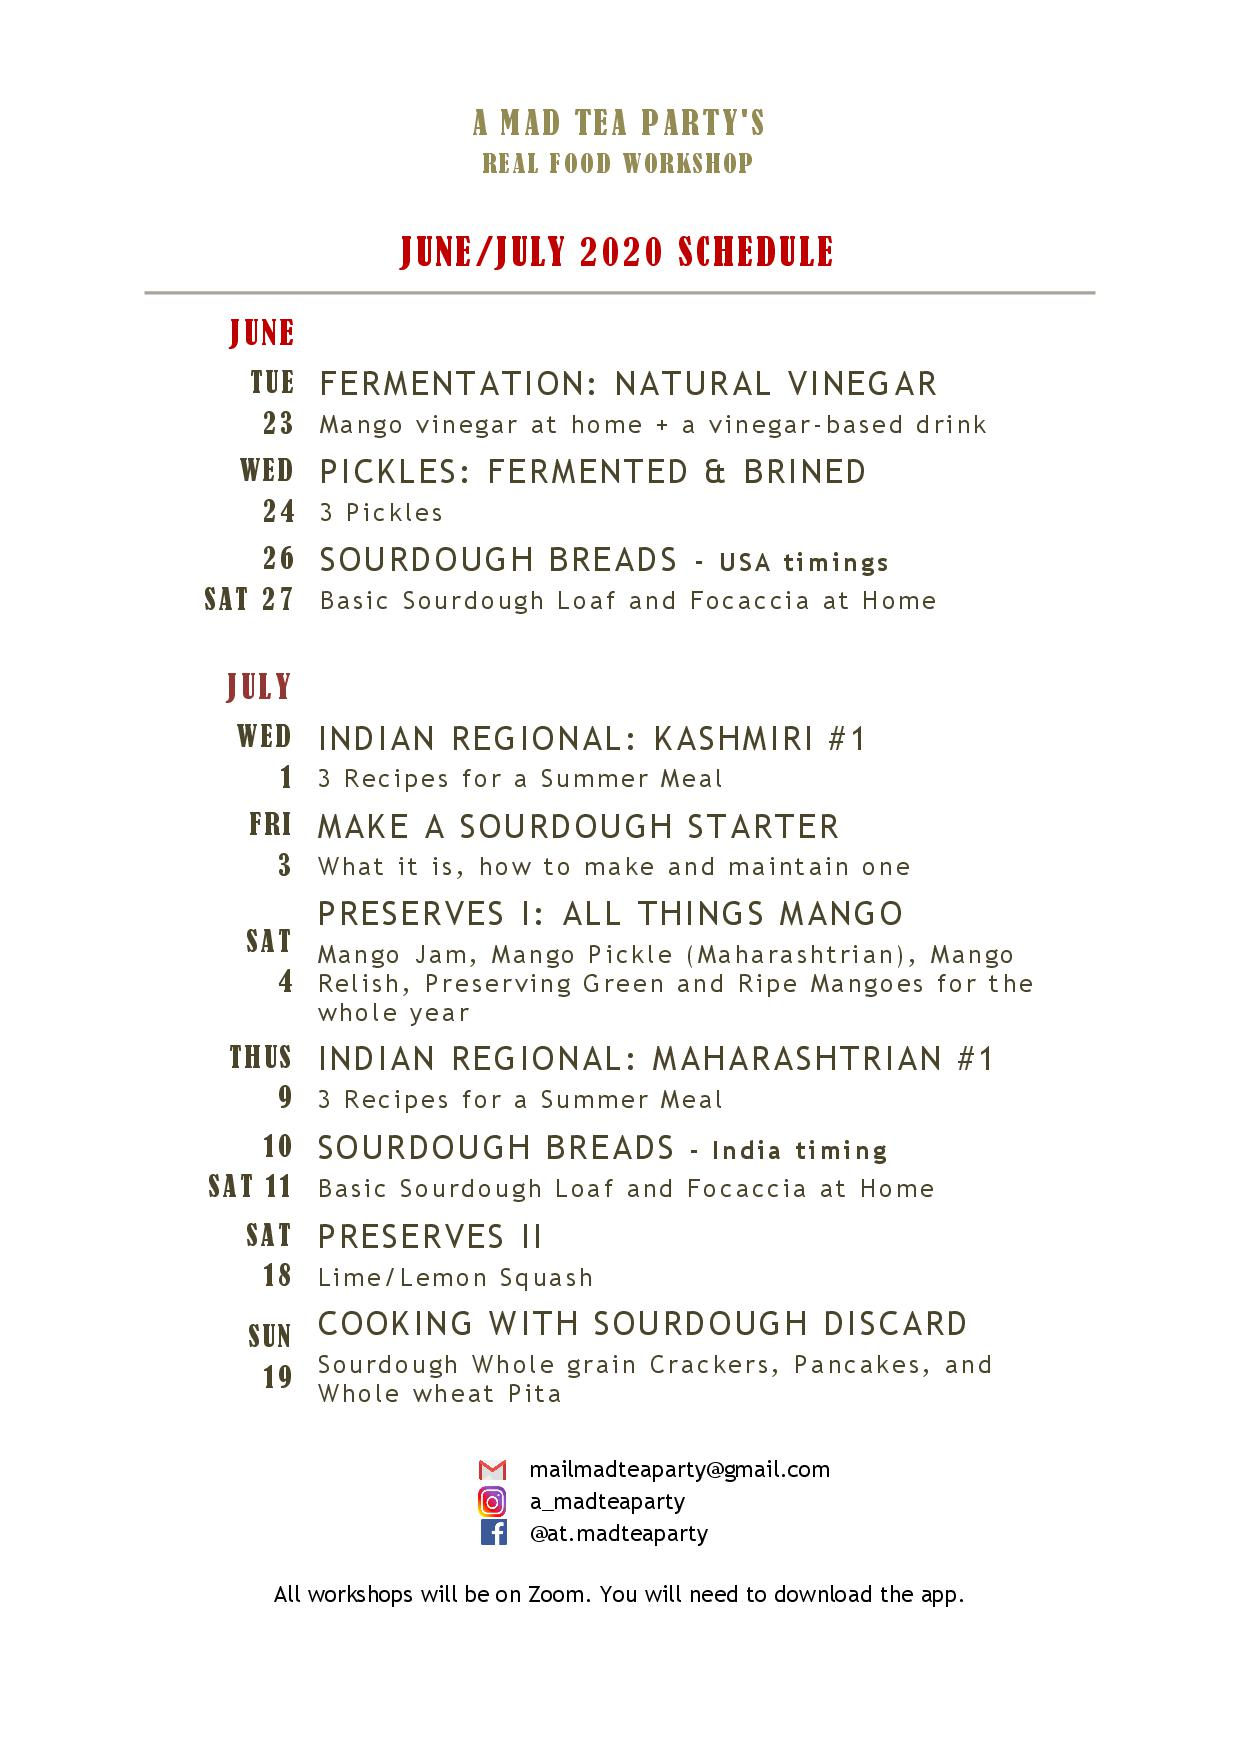 AMTP WP Jun-Jul 2020 Workshop Schedule